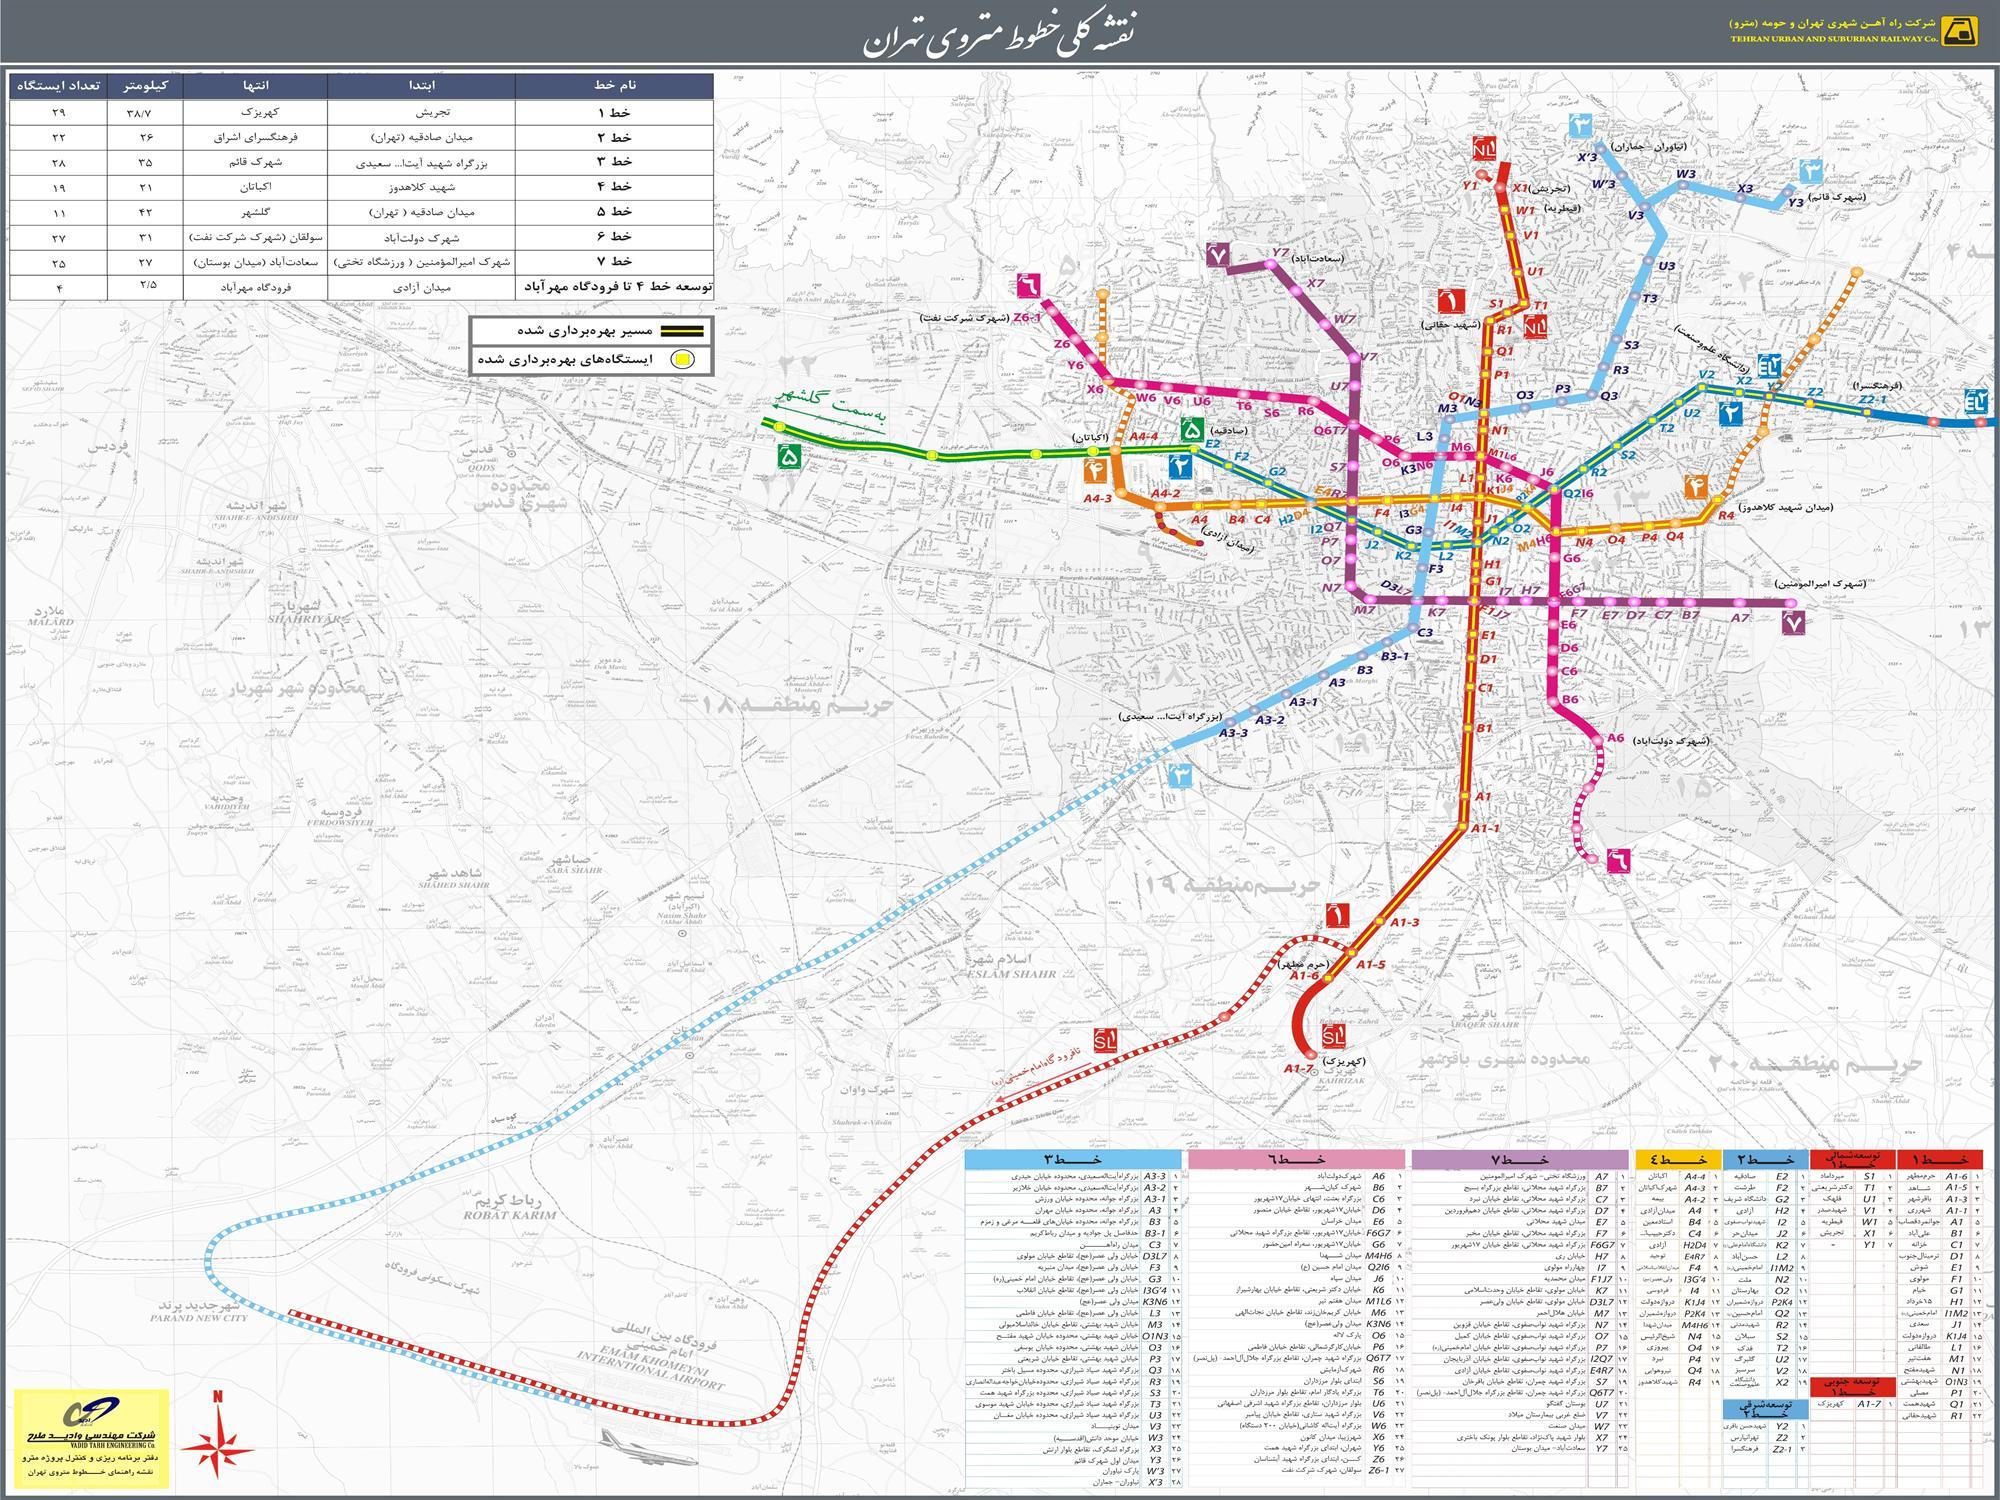 tehran ,metro, map, subway, tehran metro map